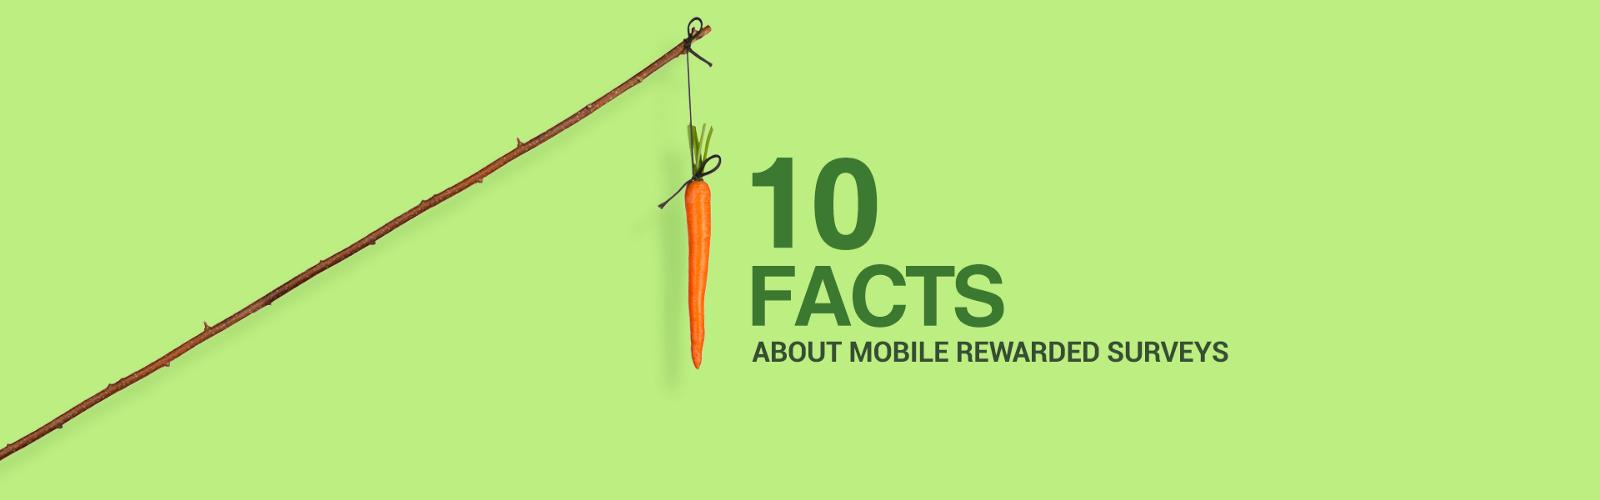 /10-facts-about-mobile-rewarded-surveys-dfee683f536e feature image